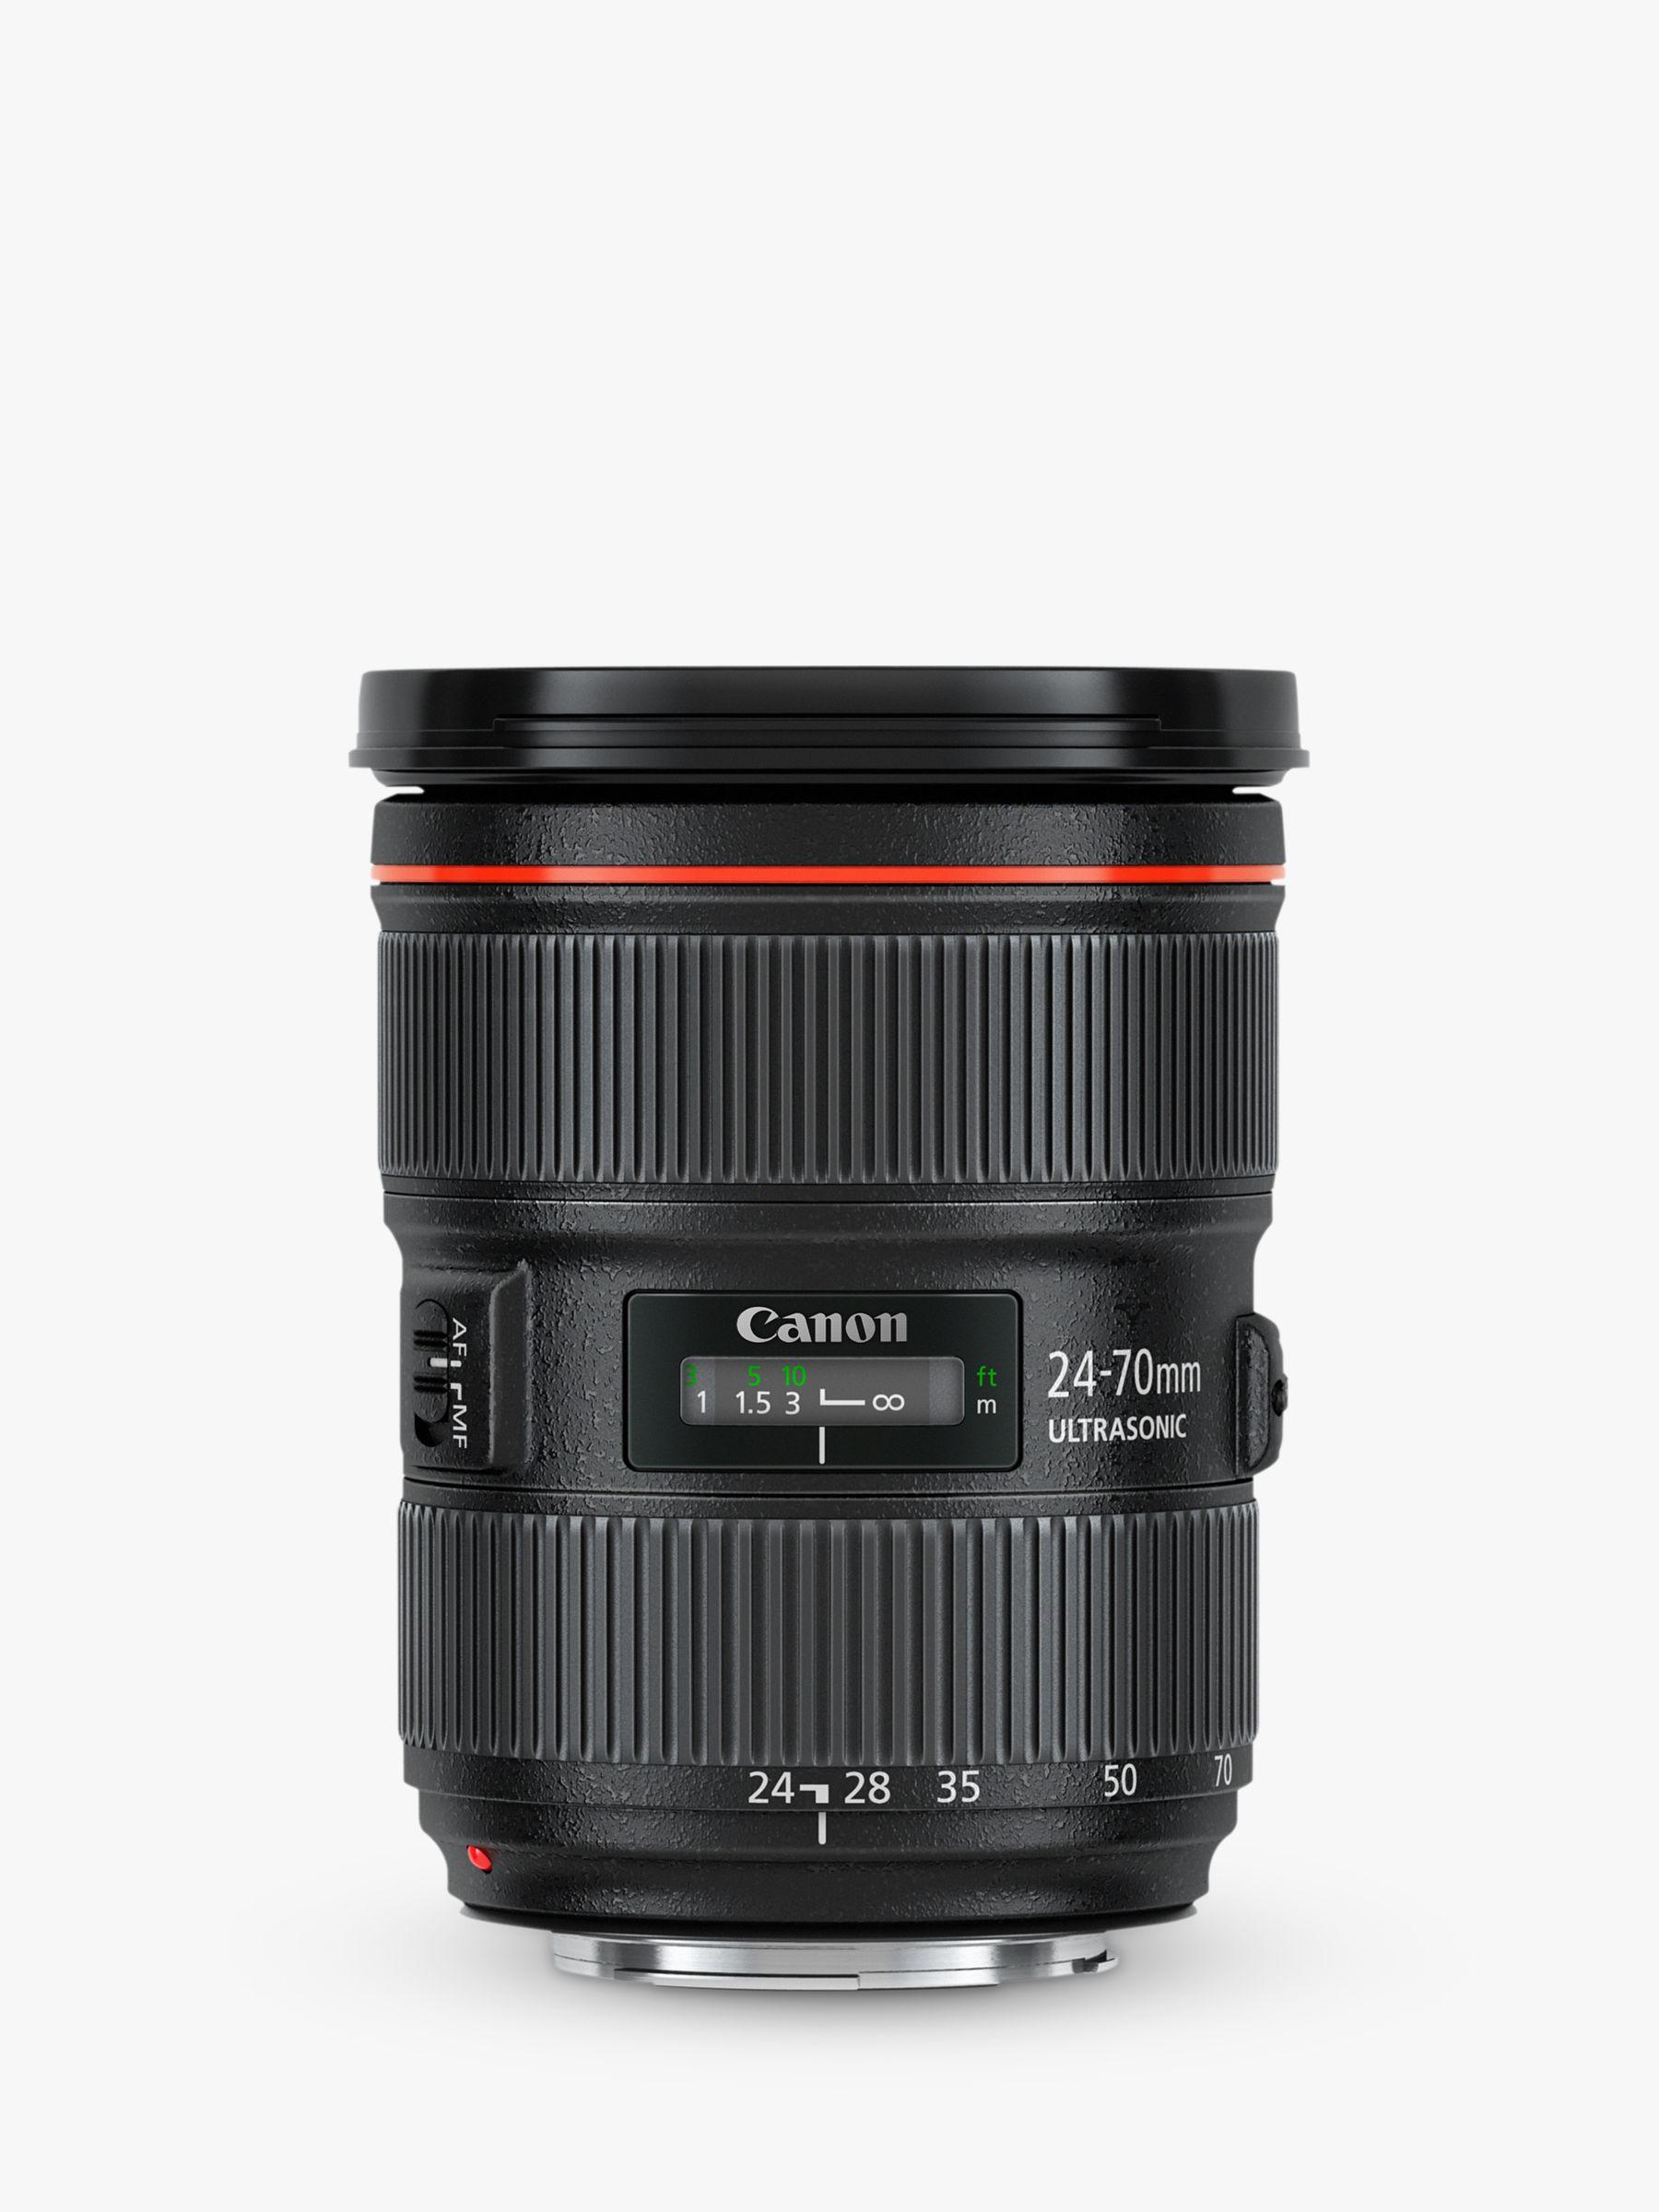 Canon Ef 24 70mm F 28l Ii Usm Telephoto Lens At John Lewis Partners Lensa 70 200mm Is